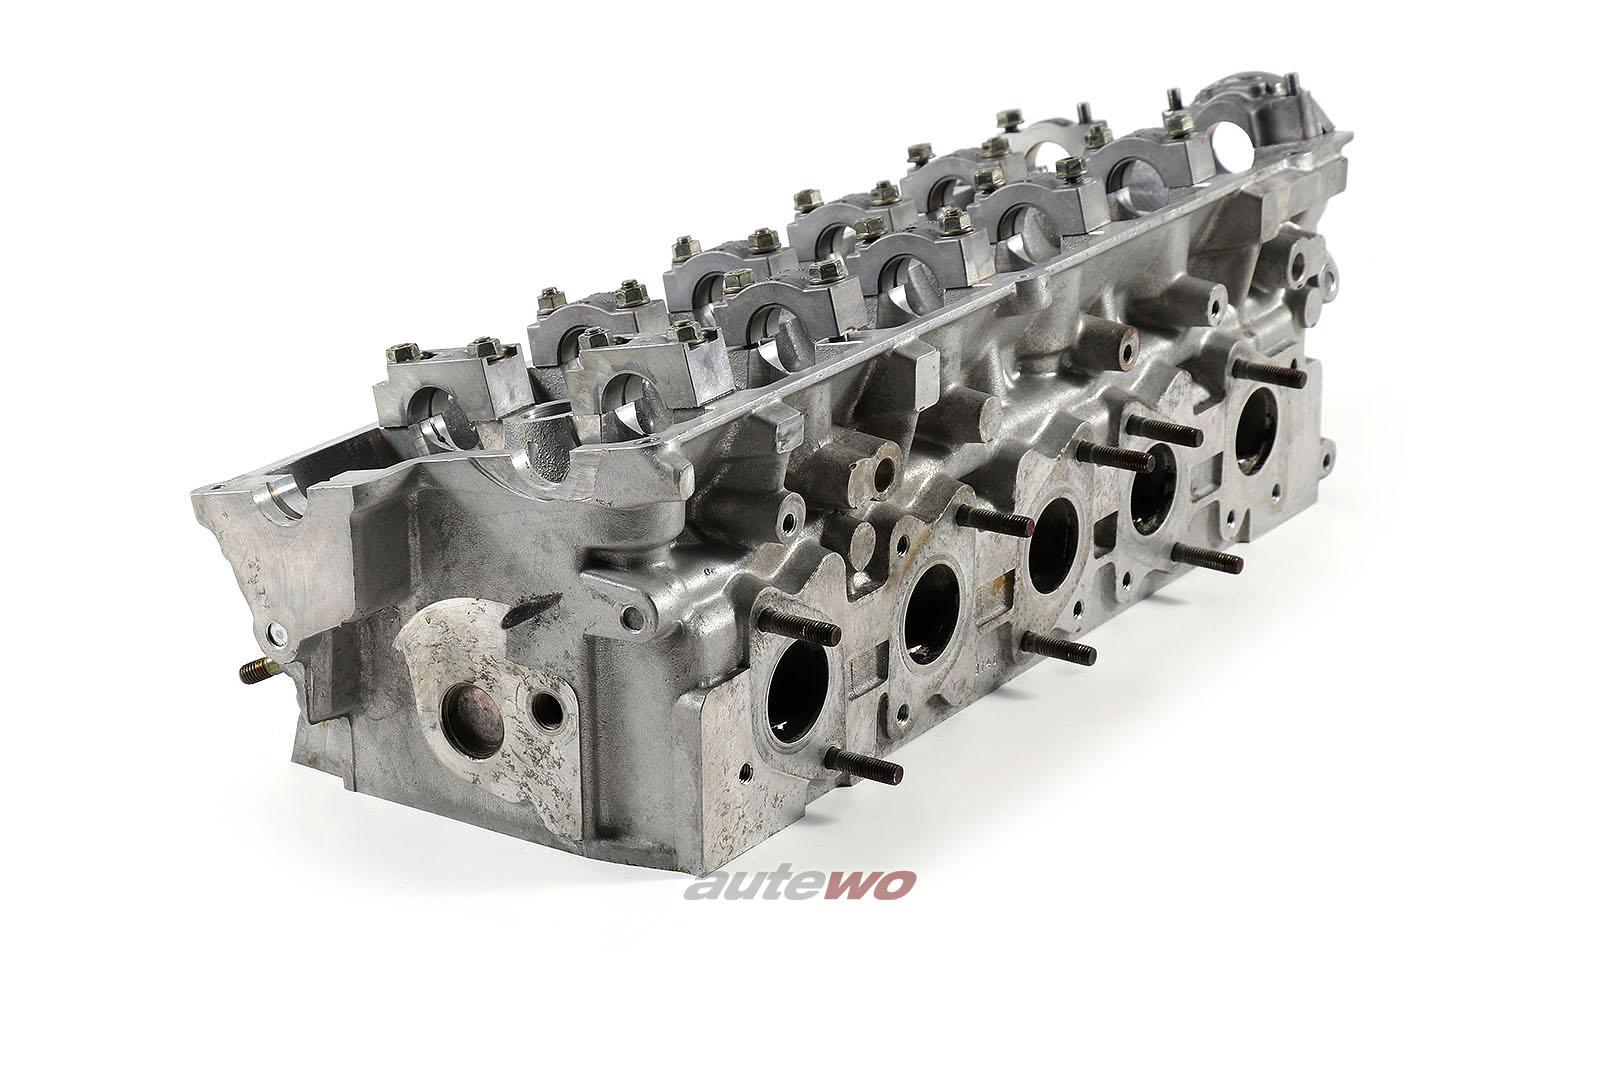 034103351N Audi 200 20V/S2/RS2/Urquattro/S4/S6 C4 2.2l Zylinderkopf bearbeitet